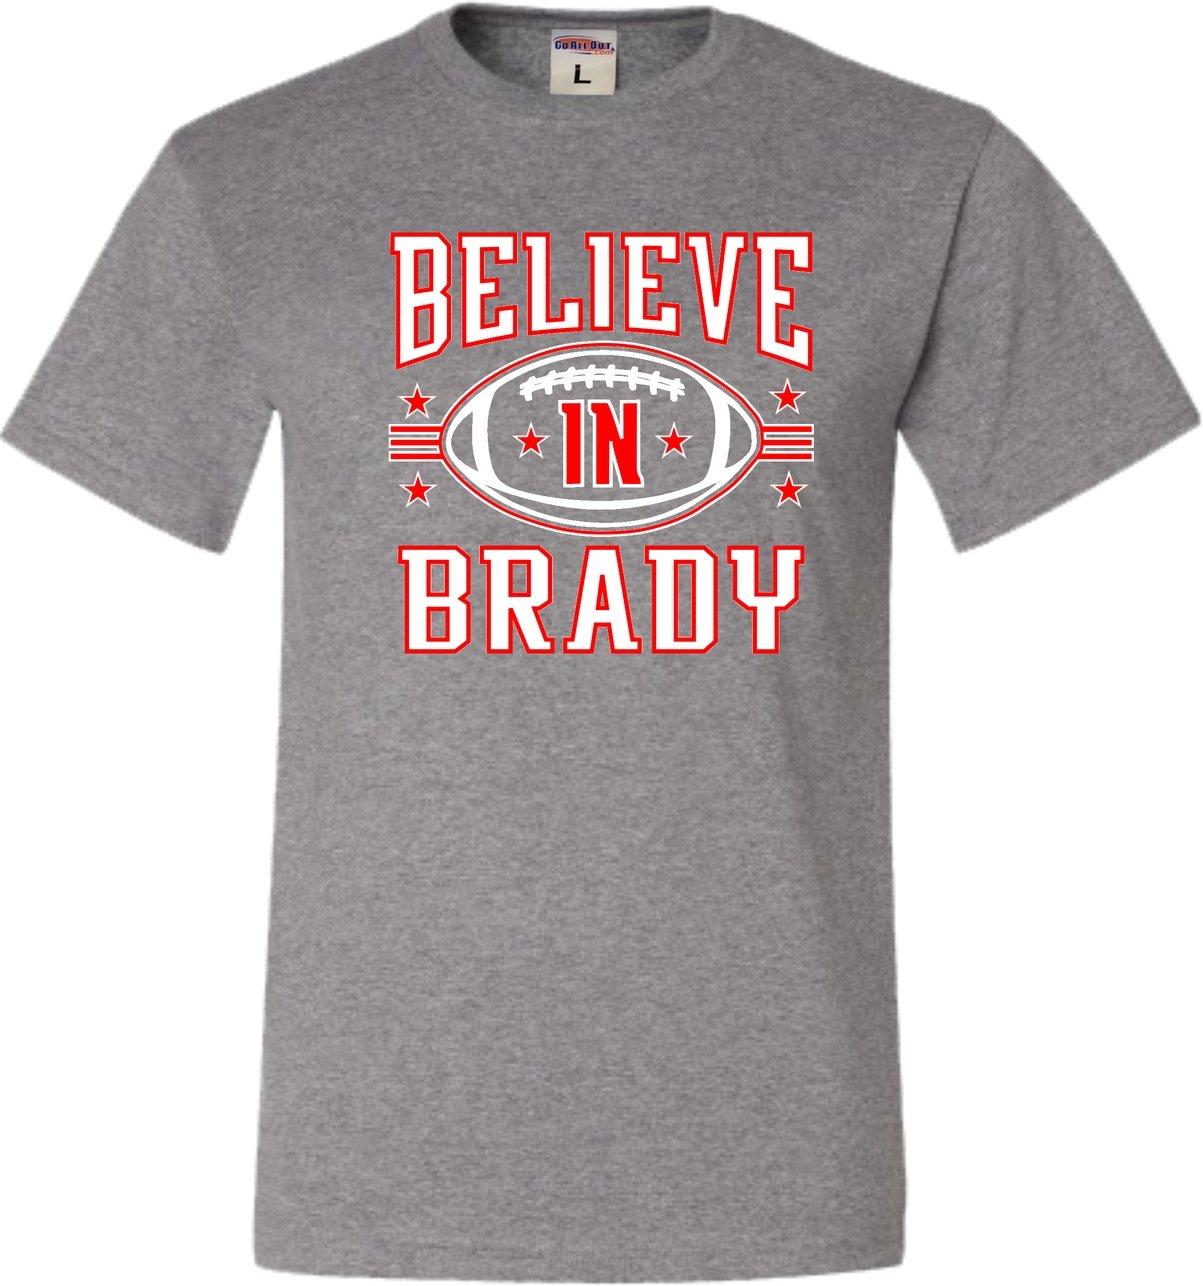 Adult Believe In Brady Football Shirts